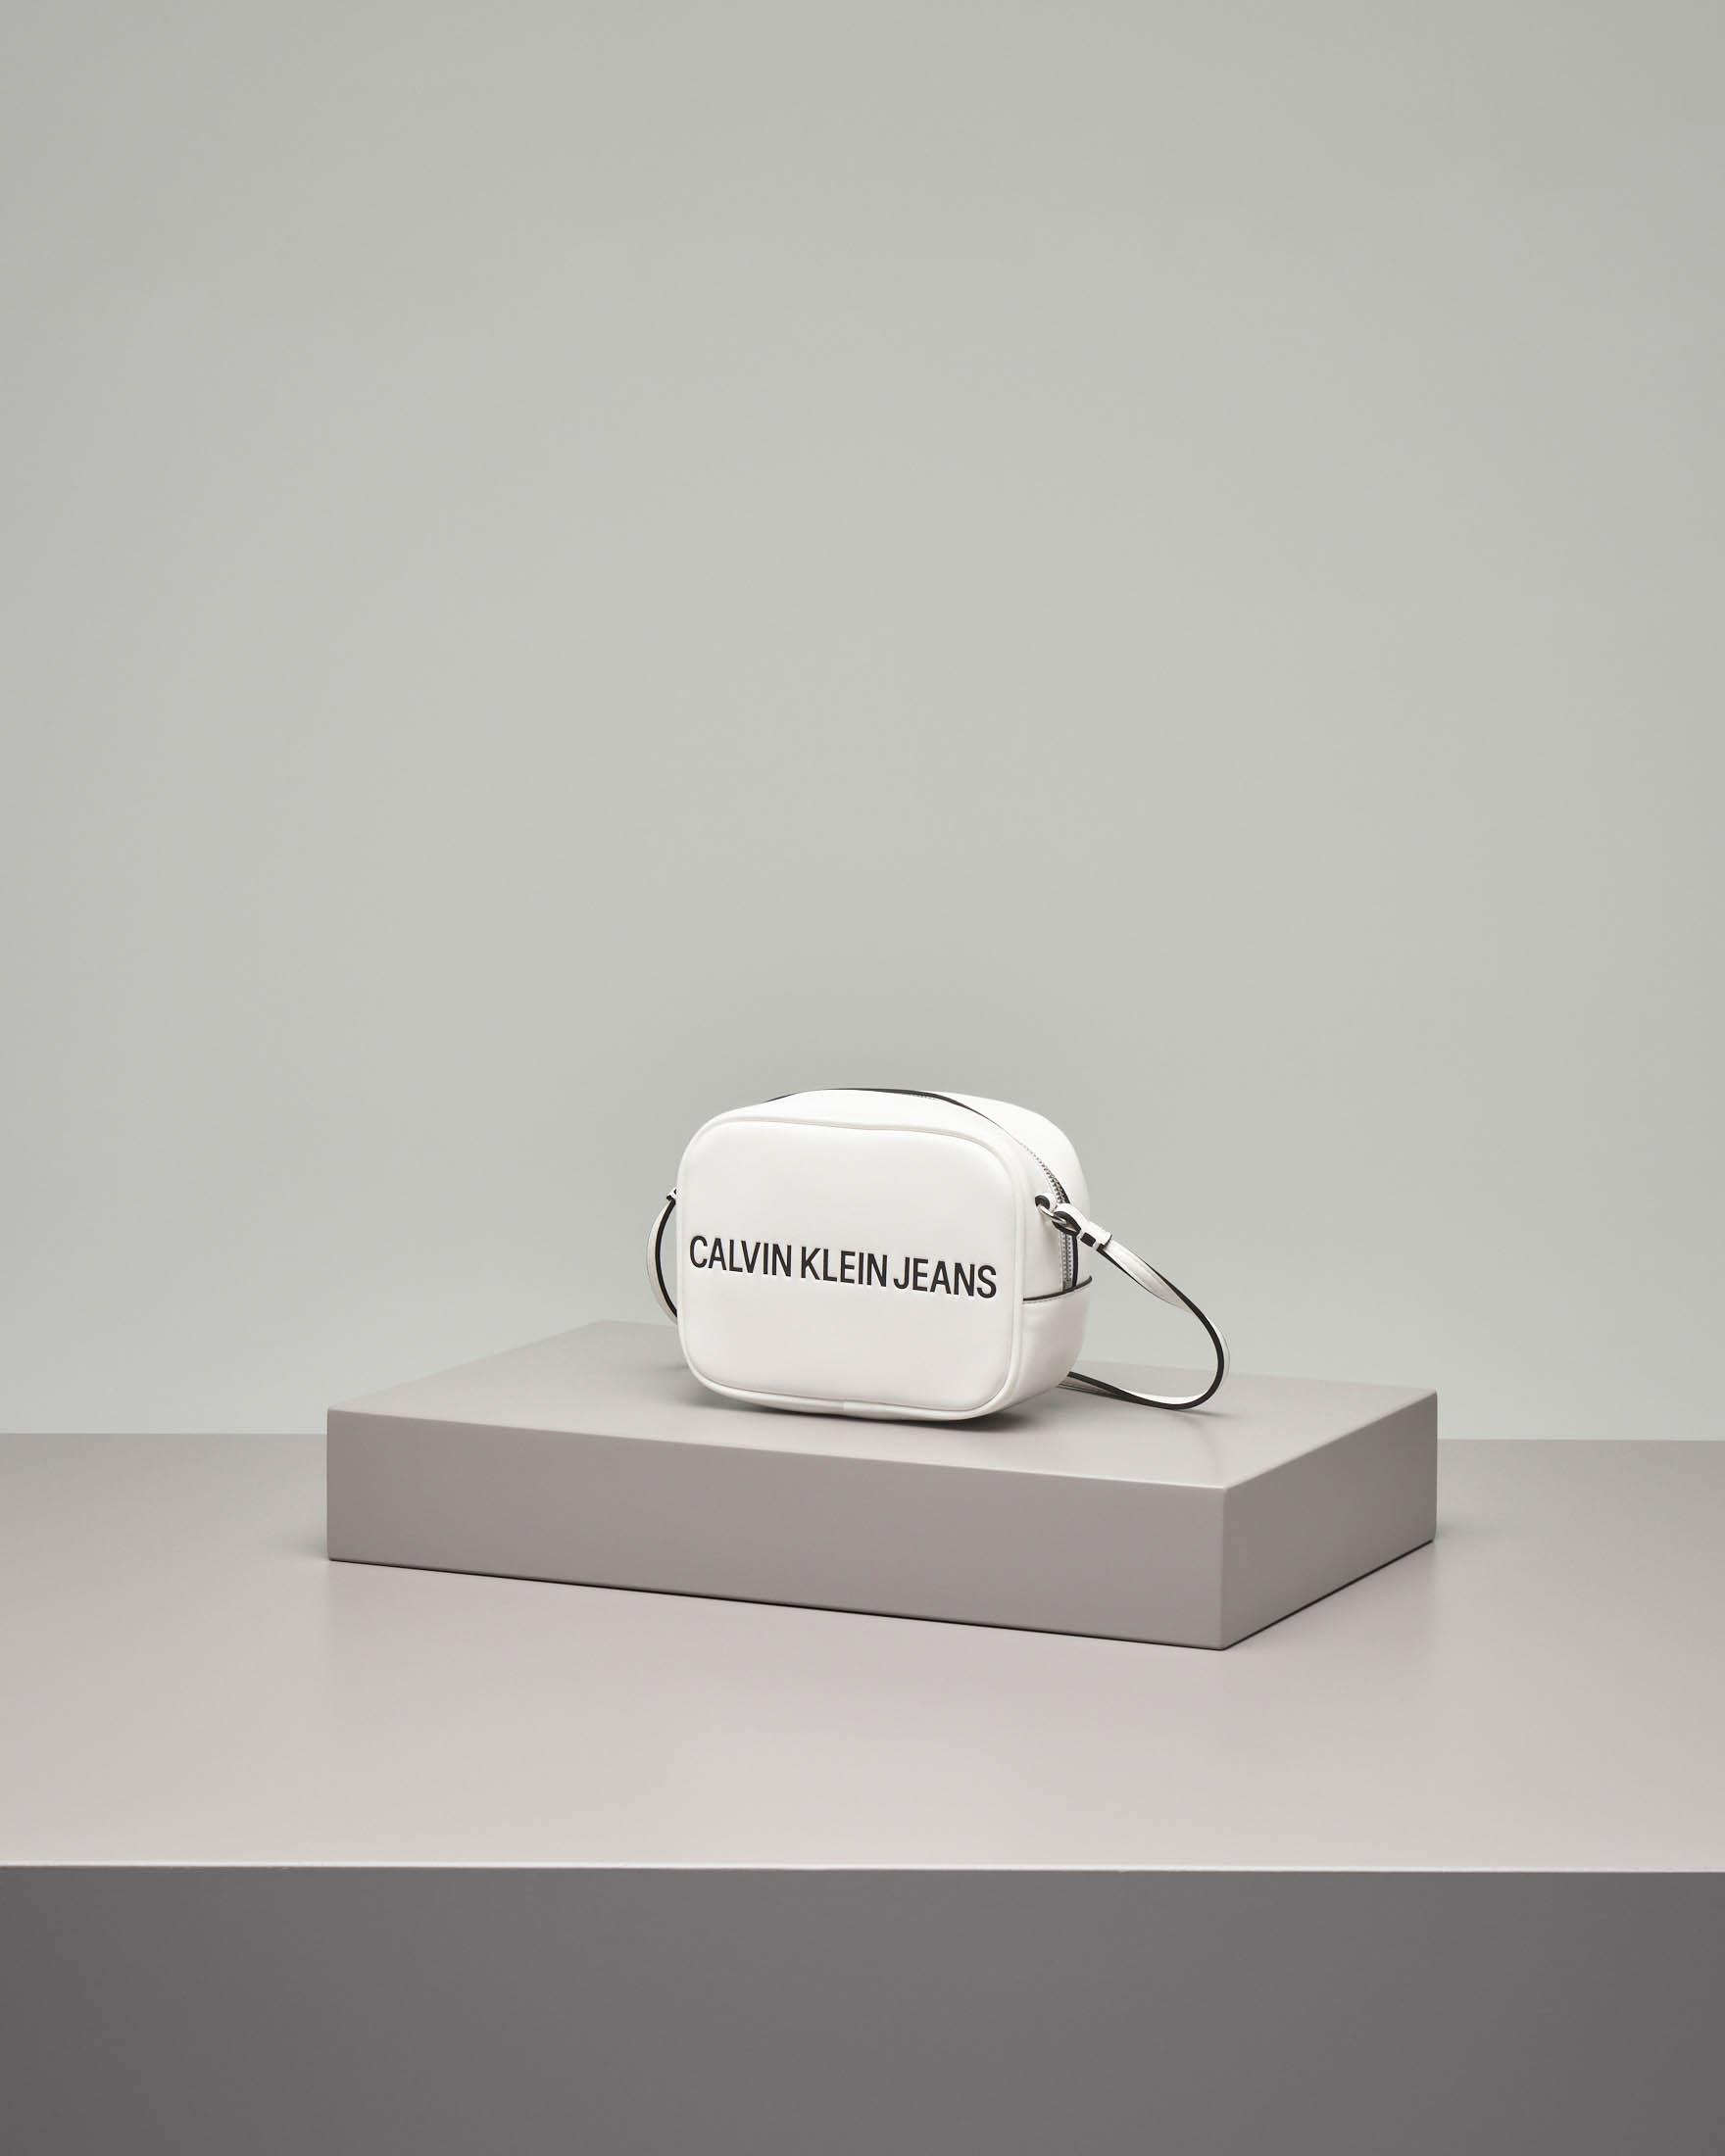 Cross bag bianca in ecopelle con scritta logo a contrasto. Misura piccola